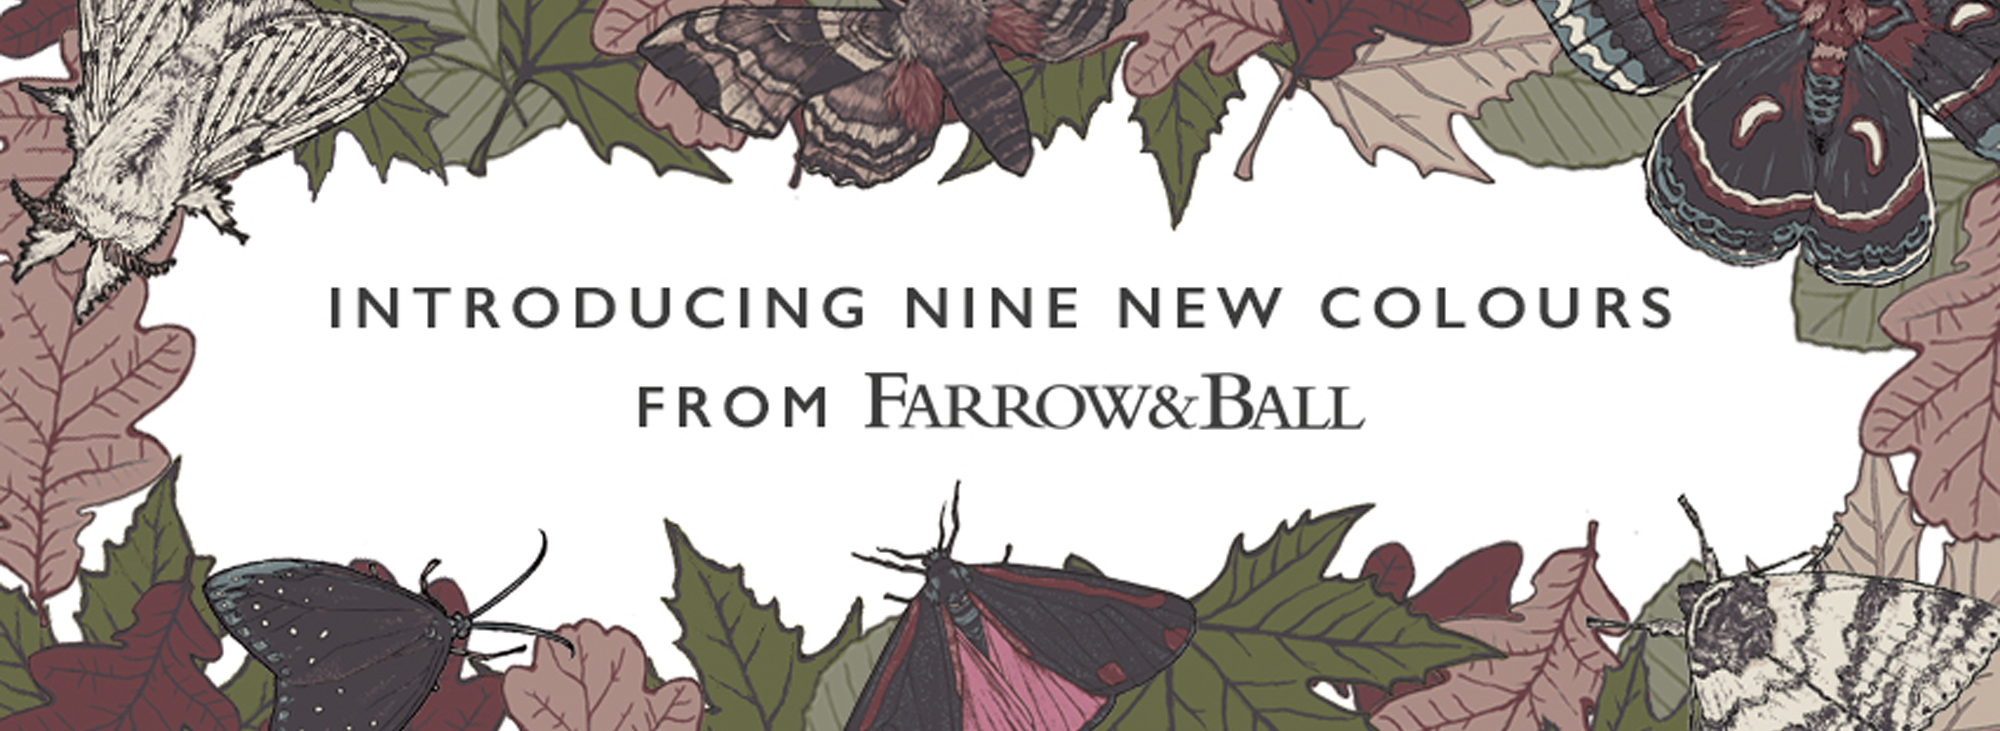 New Colours 2018 | Farrow & Ball